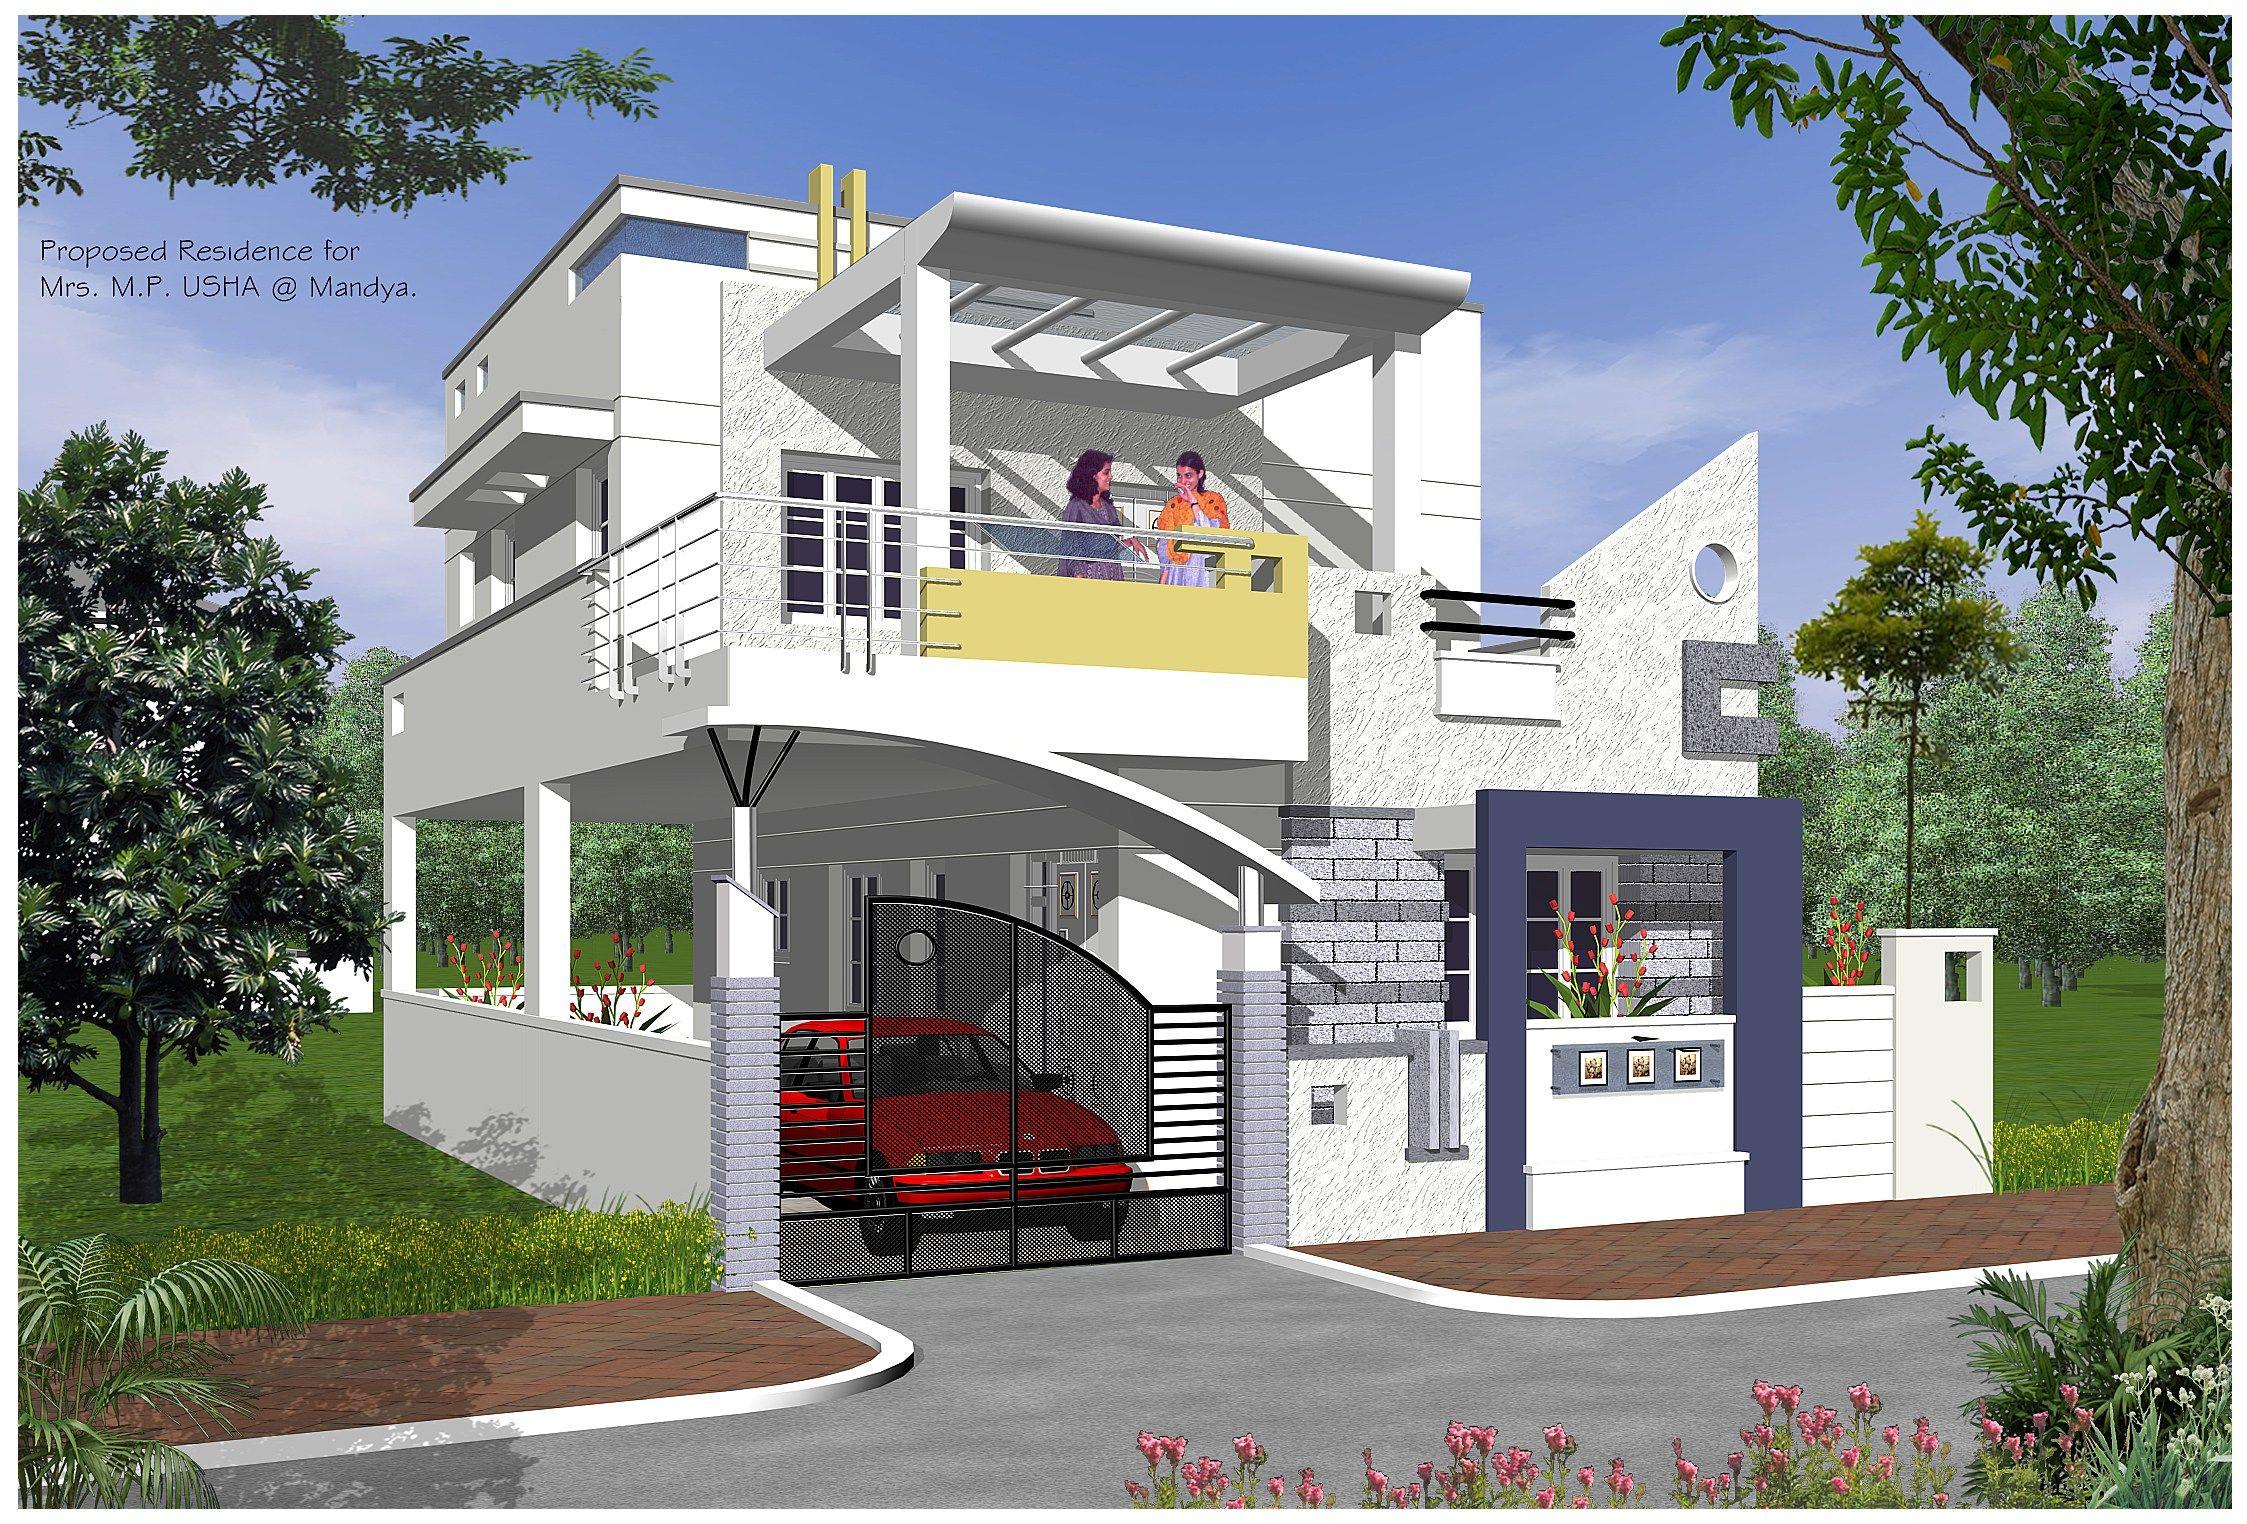 Best Kitchen Gallery: Pics Photos Vastu House Plans Designs Kitchen Design Large South of Home House Design  on rachelxblog.com